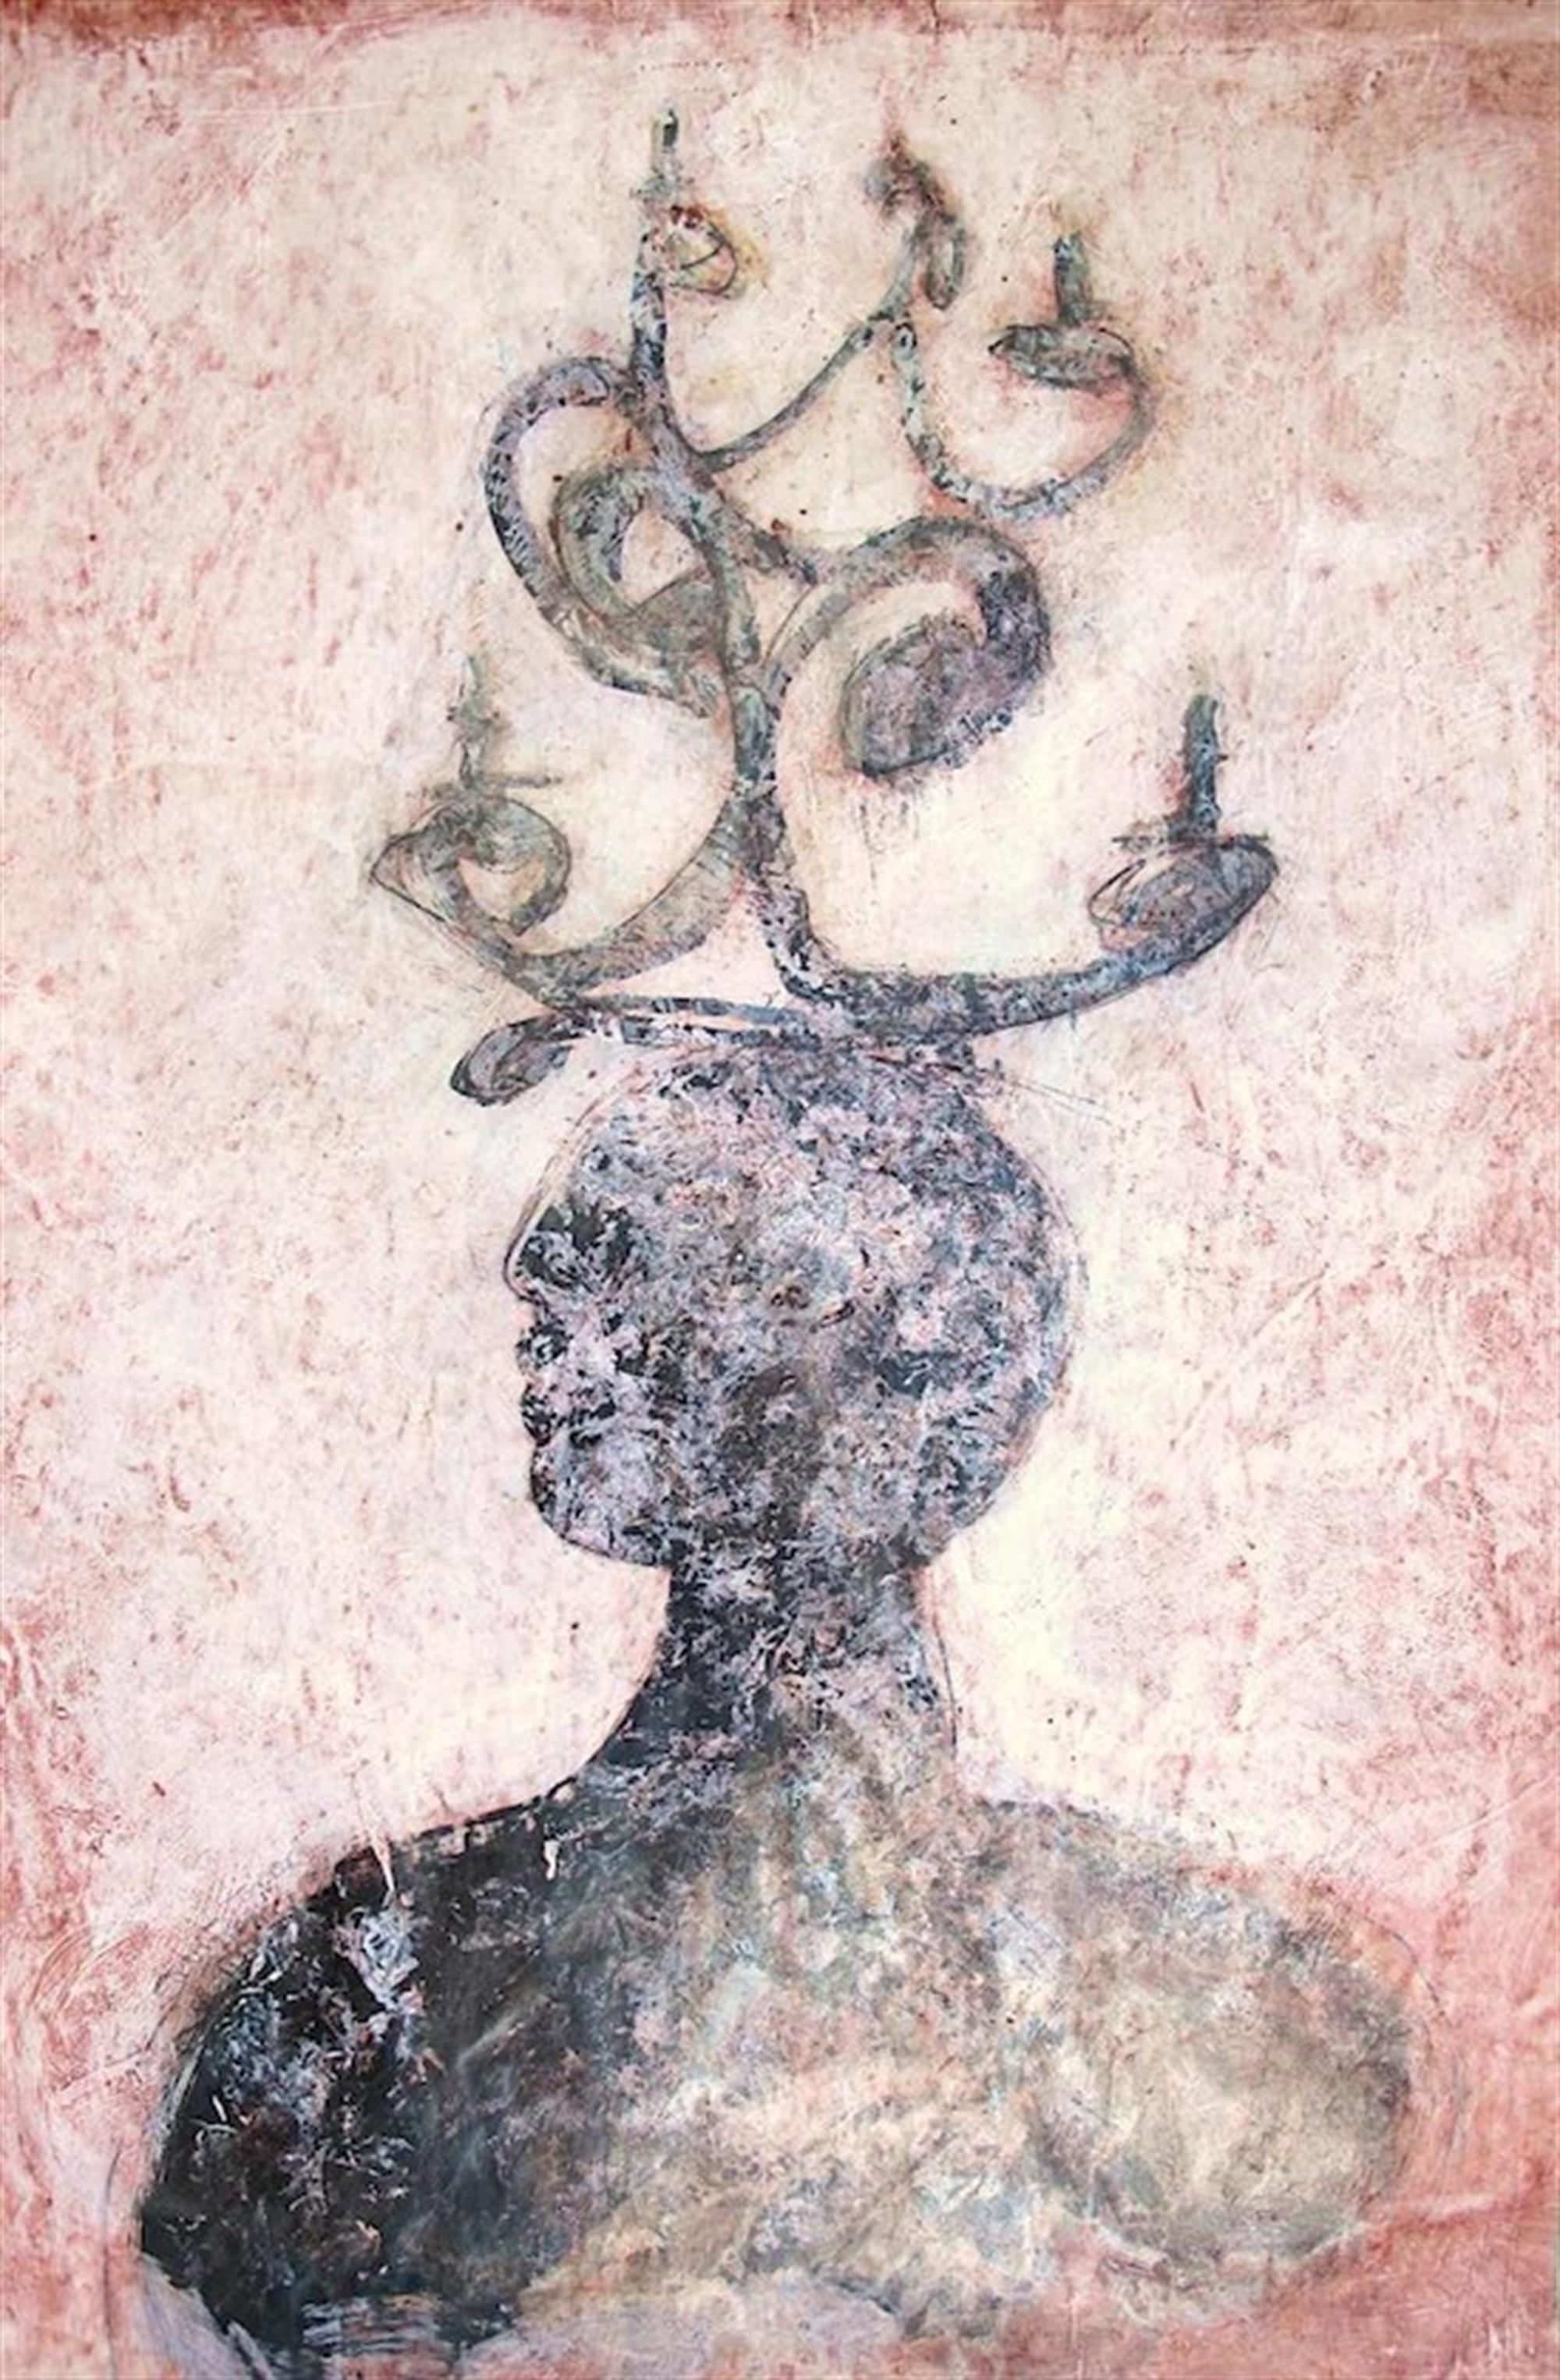 Candlebearer II by Chrissy Dolan-Terrasi